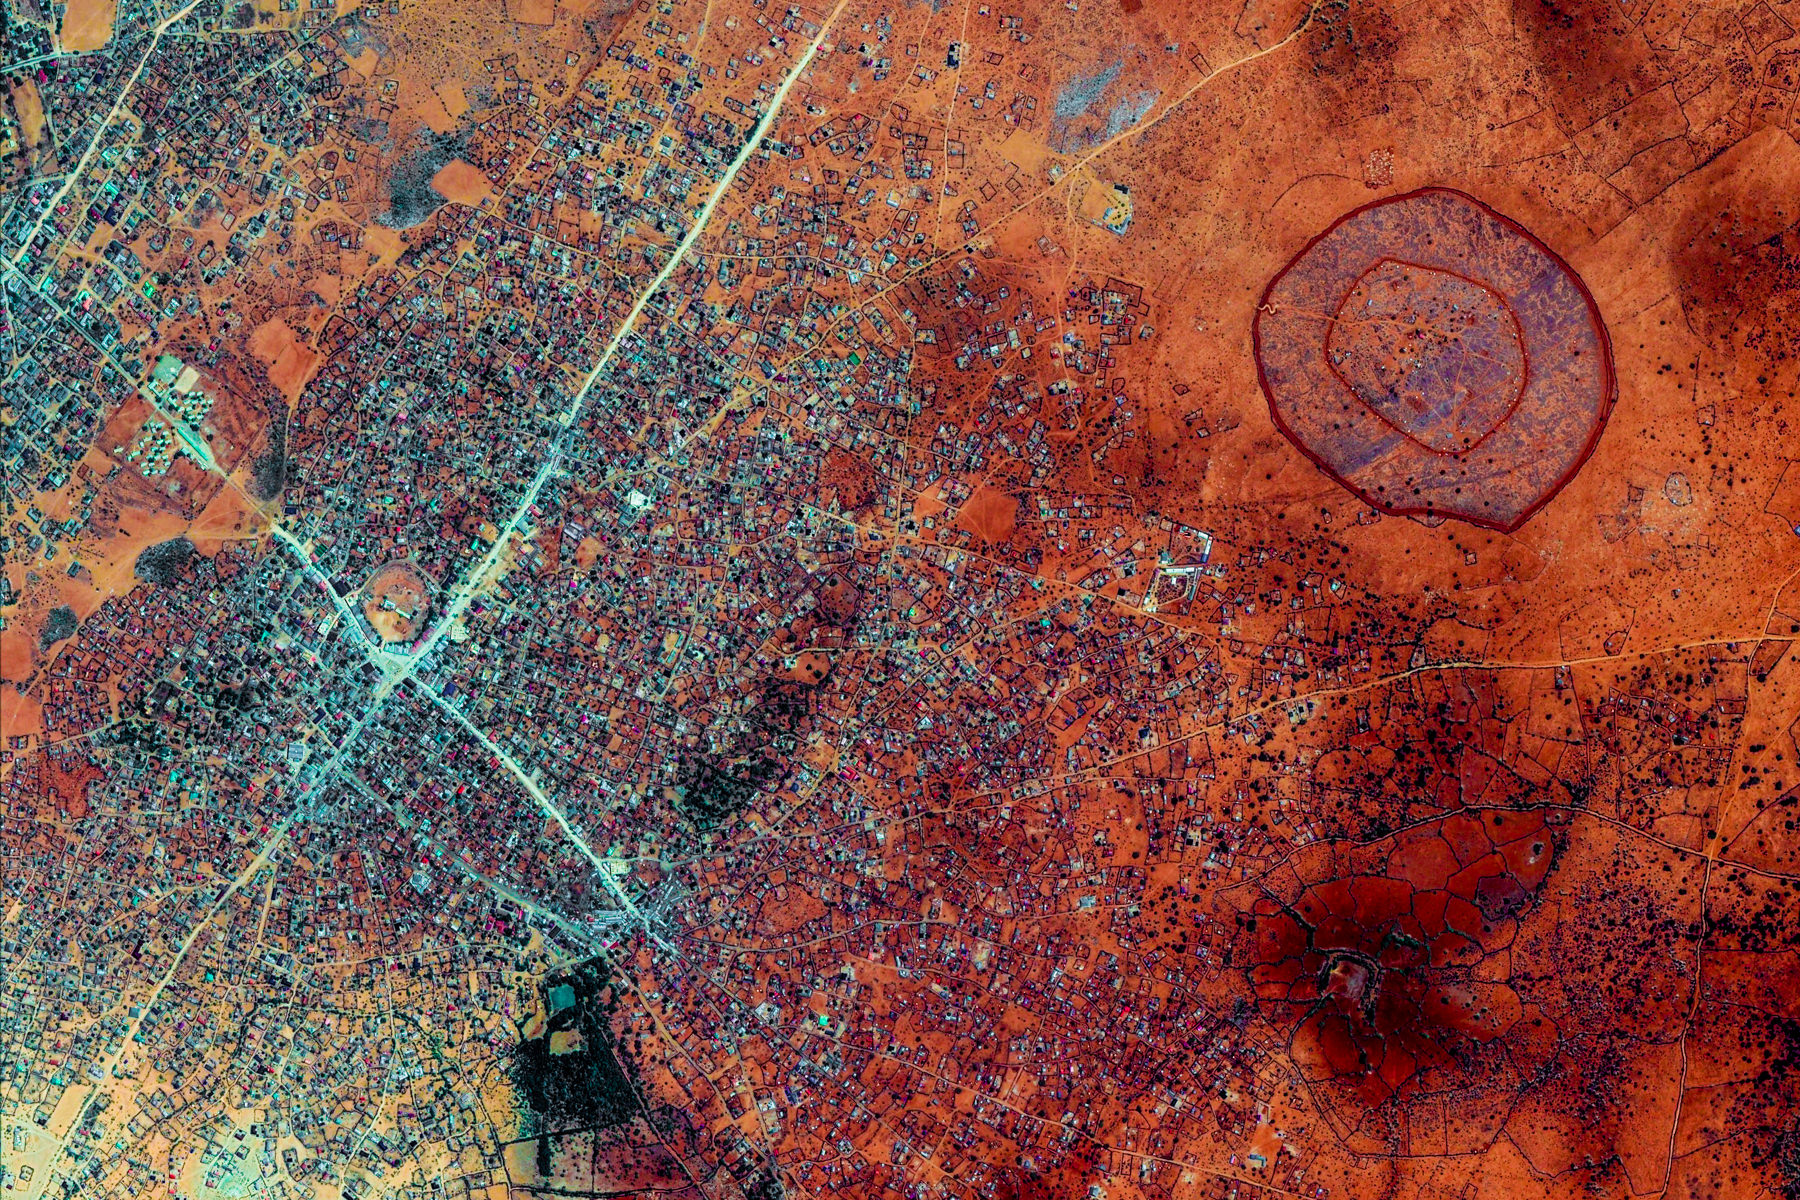 google-earth-Somalia-BuulaXaawo-12261